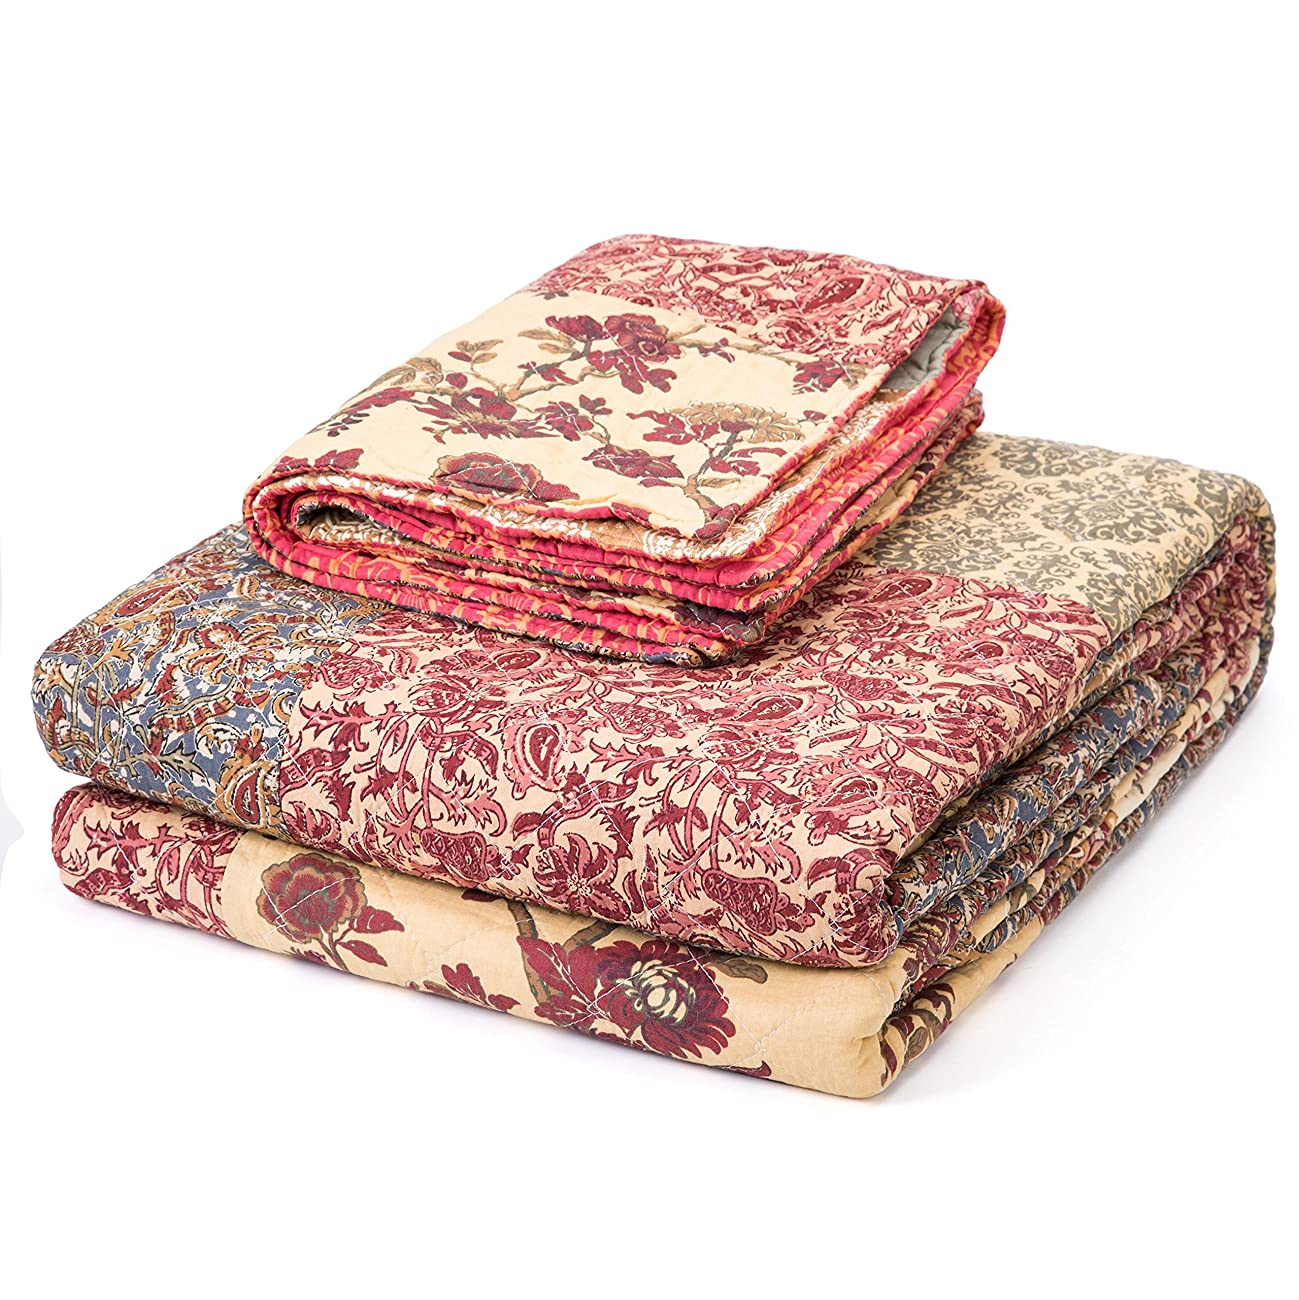 Luxury Retro Floral Stitching Cotton Patchwork Bedspread Sets Quilt Queen Size 6